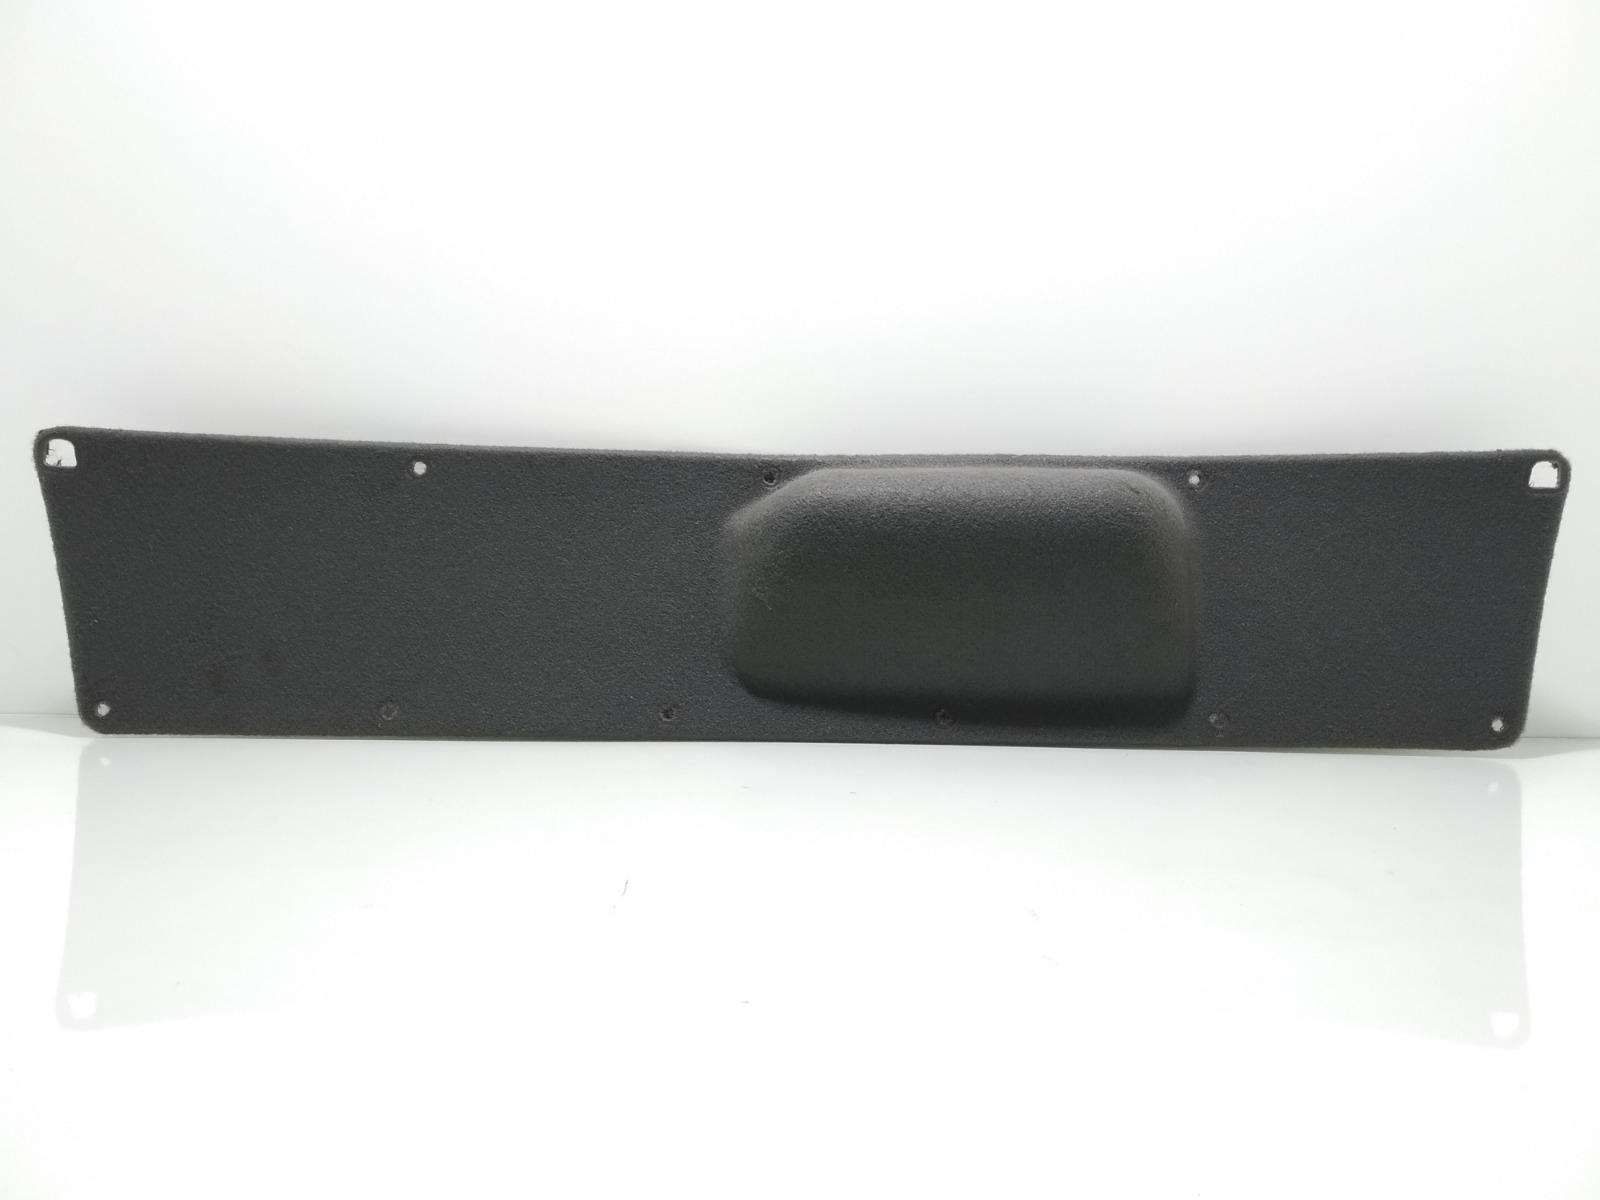 Обшивка крышки багажника Opel Corsa B 1.2 I 1999 (б/у)